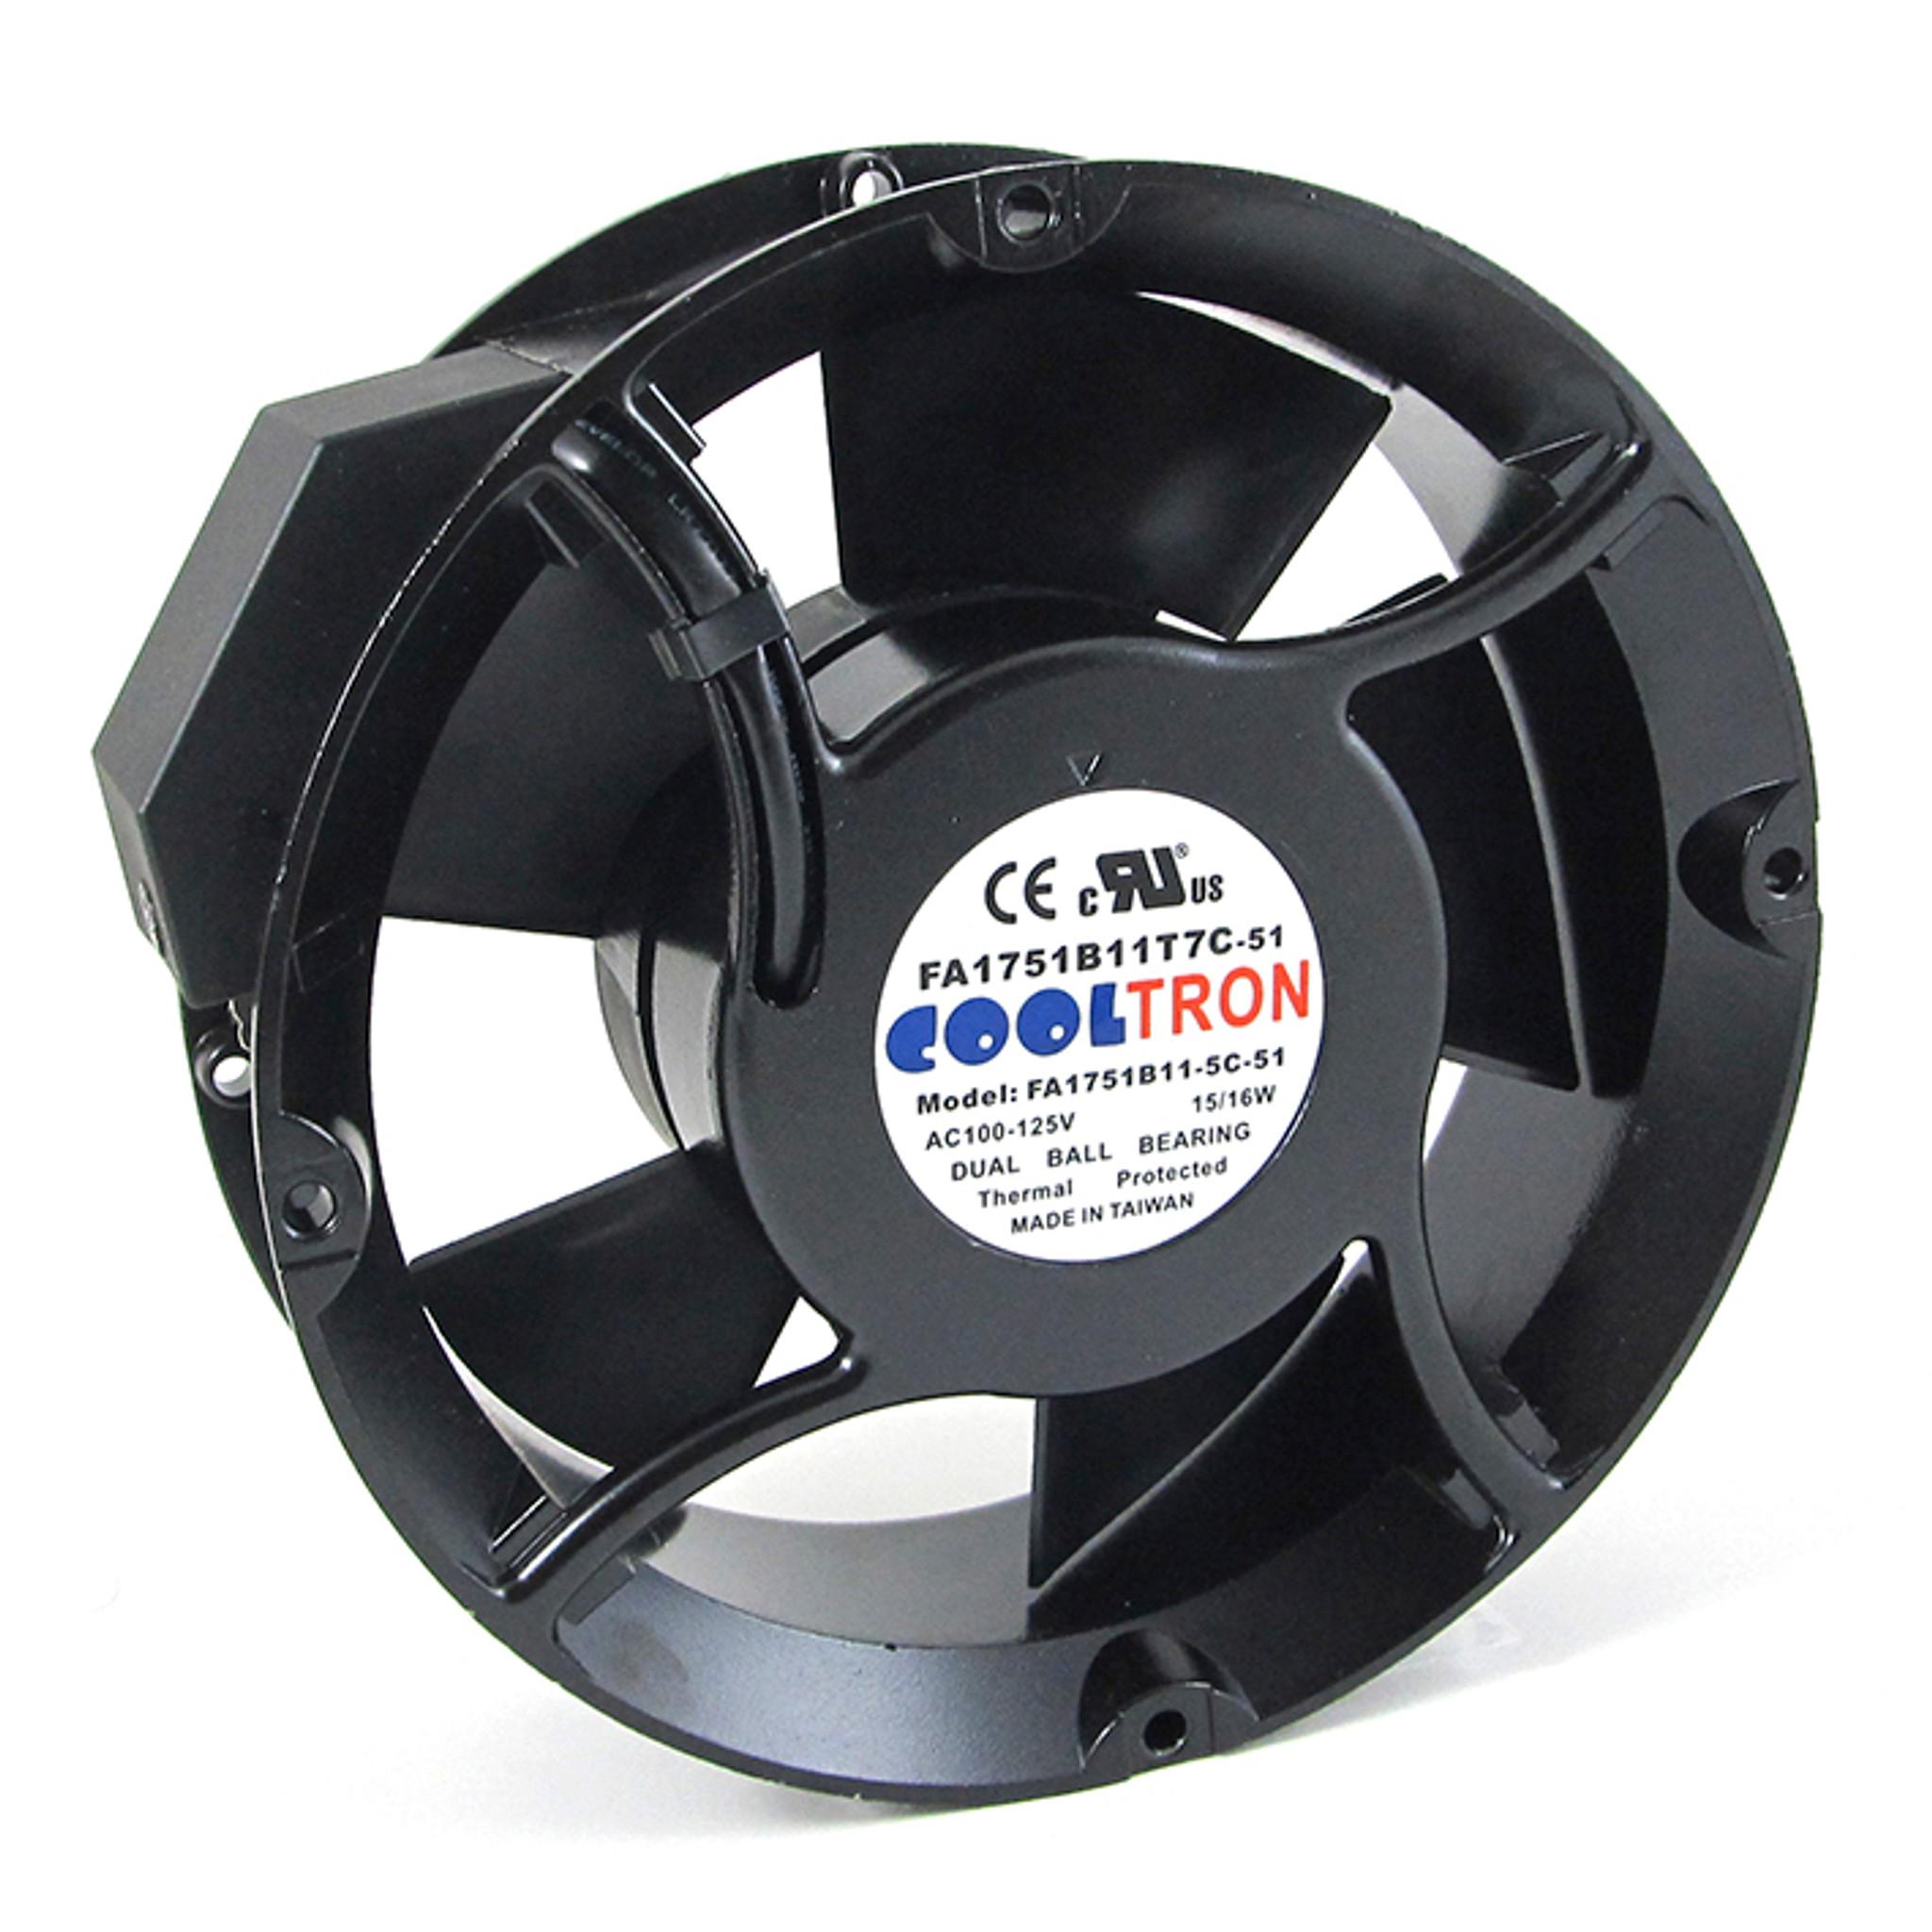 115v Ac Cooltron Fan 216 170mm X 51mm High Speed Ac Infinity